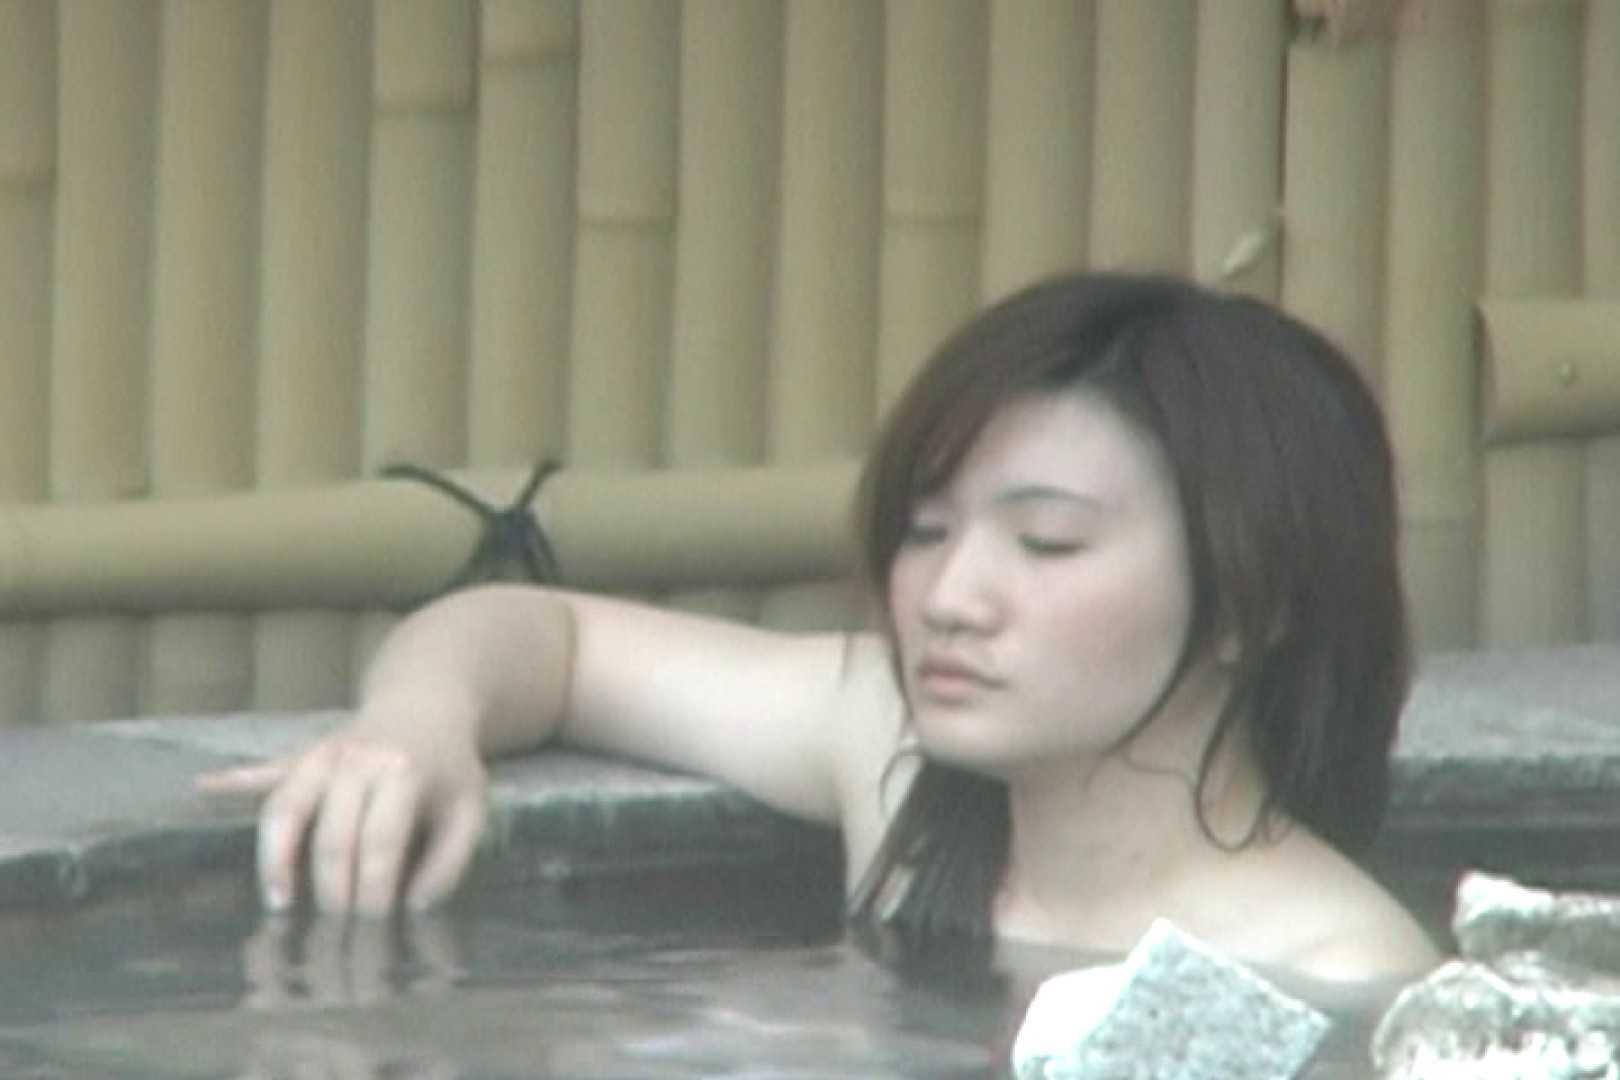 Aquaな露天風呂Vol.590 HなOL 濡れ場動画紹介 112pic 32